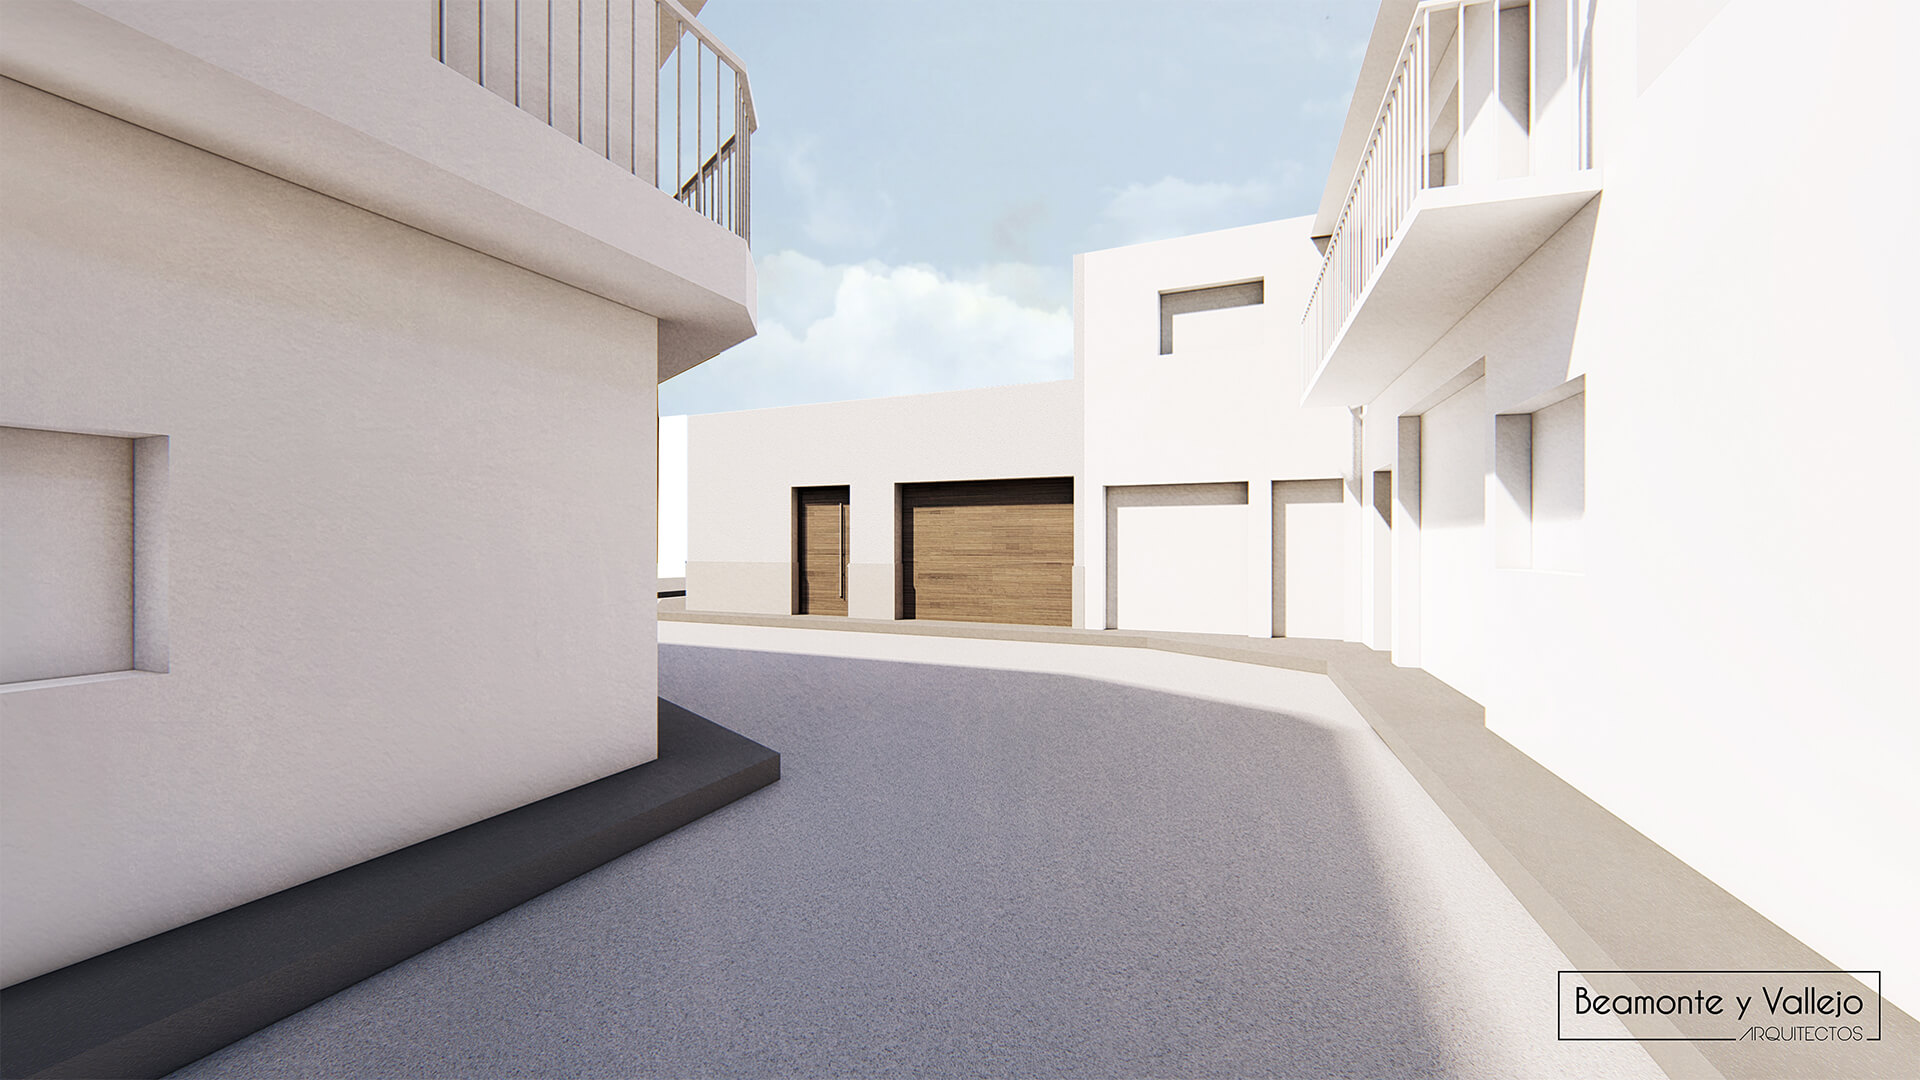 Beamonte y Vallejo Arquitectos - Passivhaus Leciñena 7